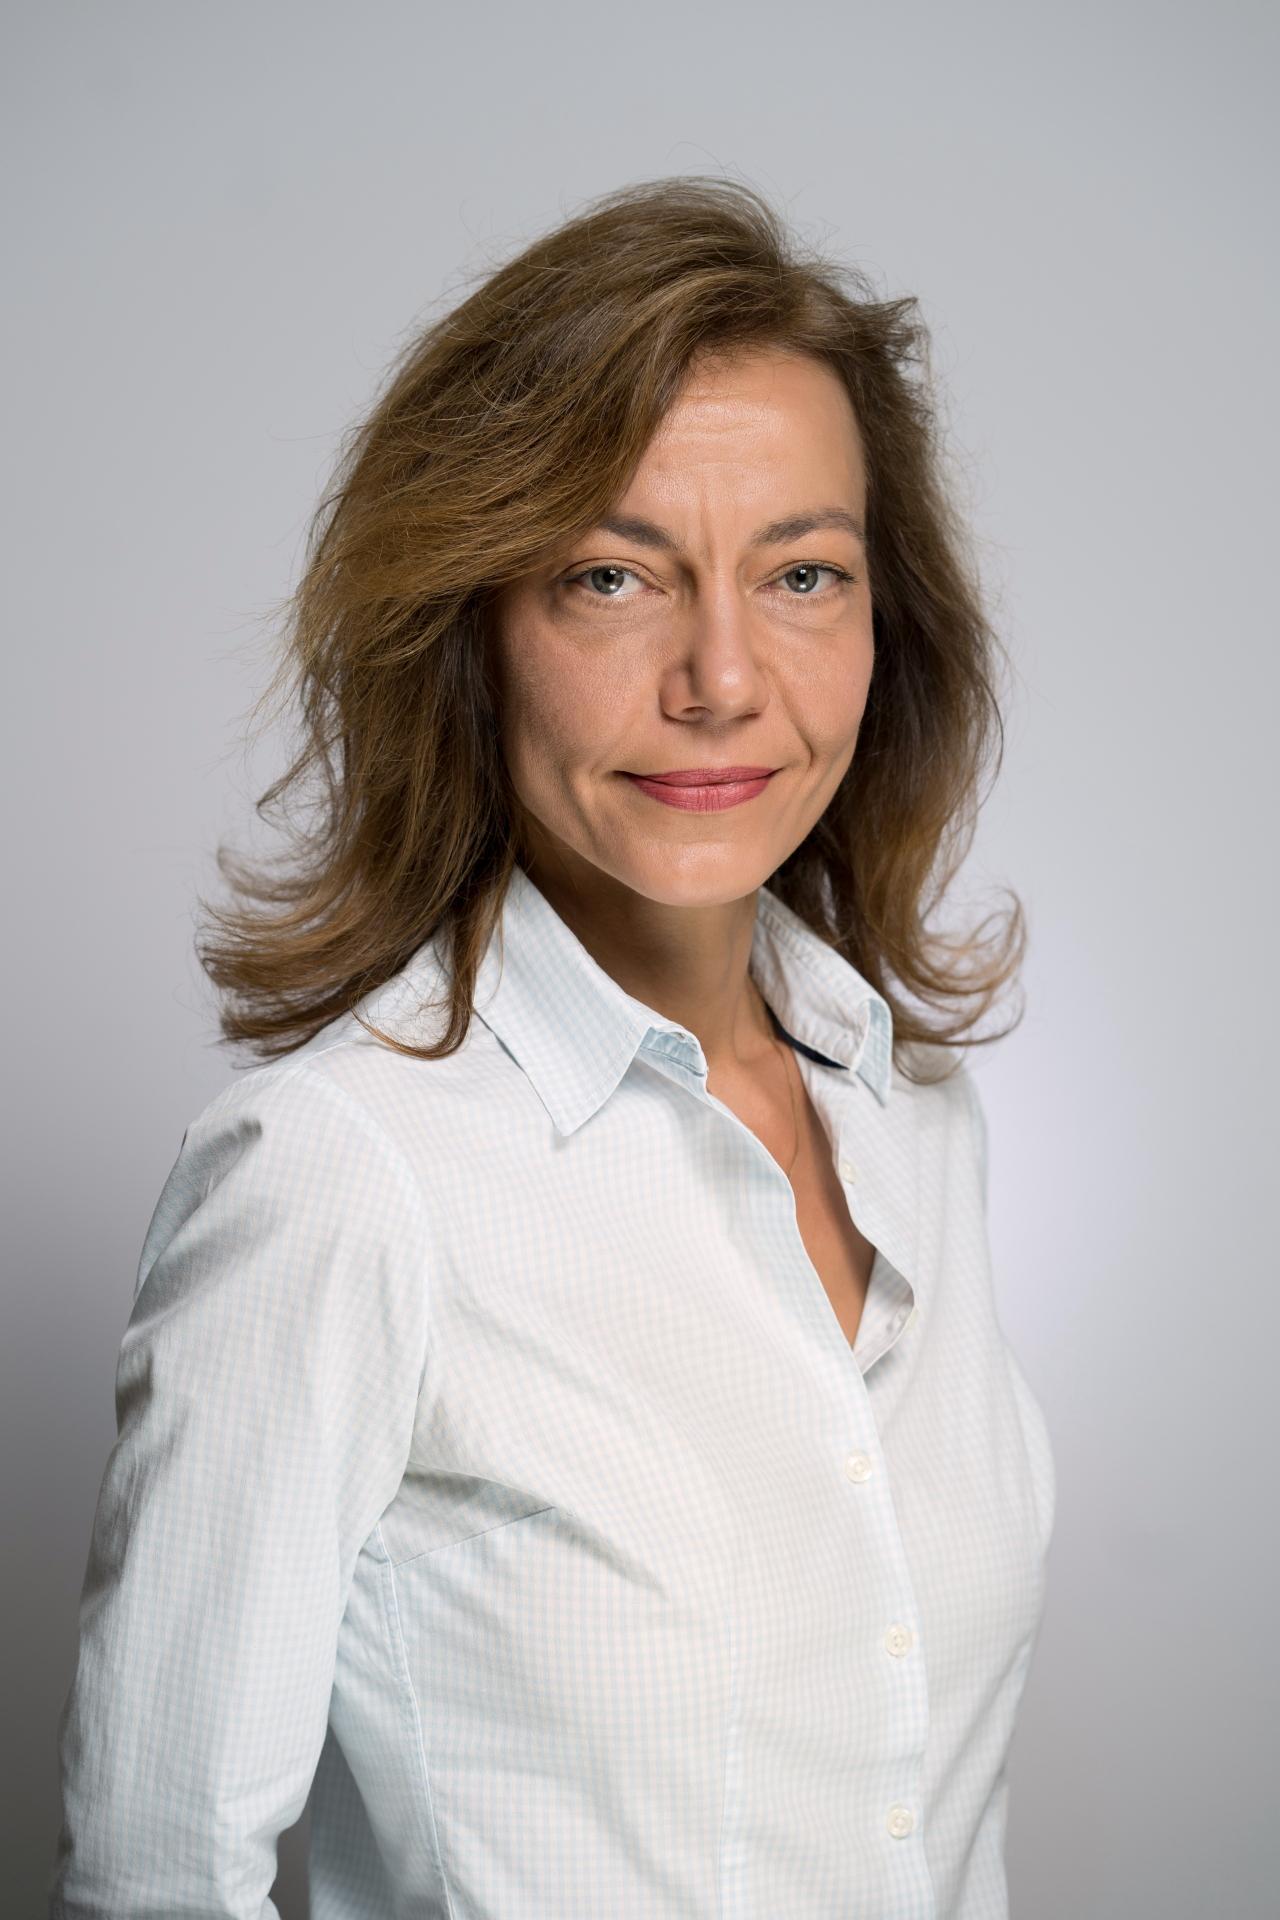 Dr. Ziger Erika